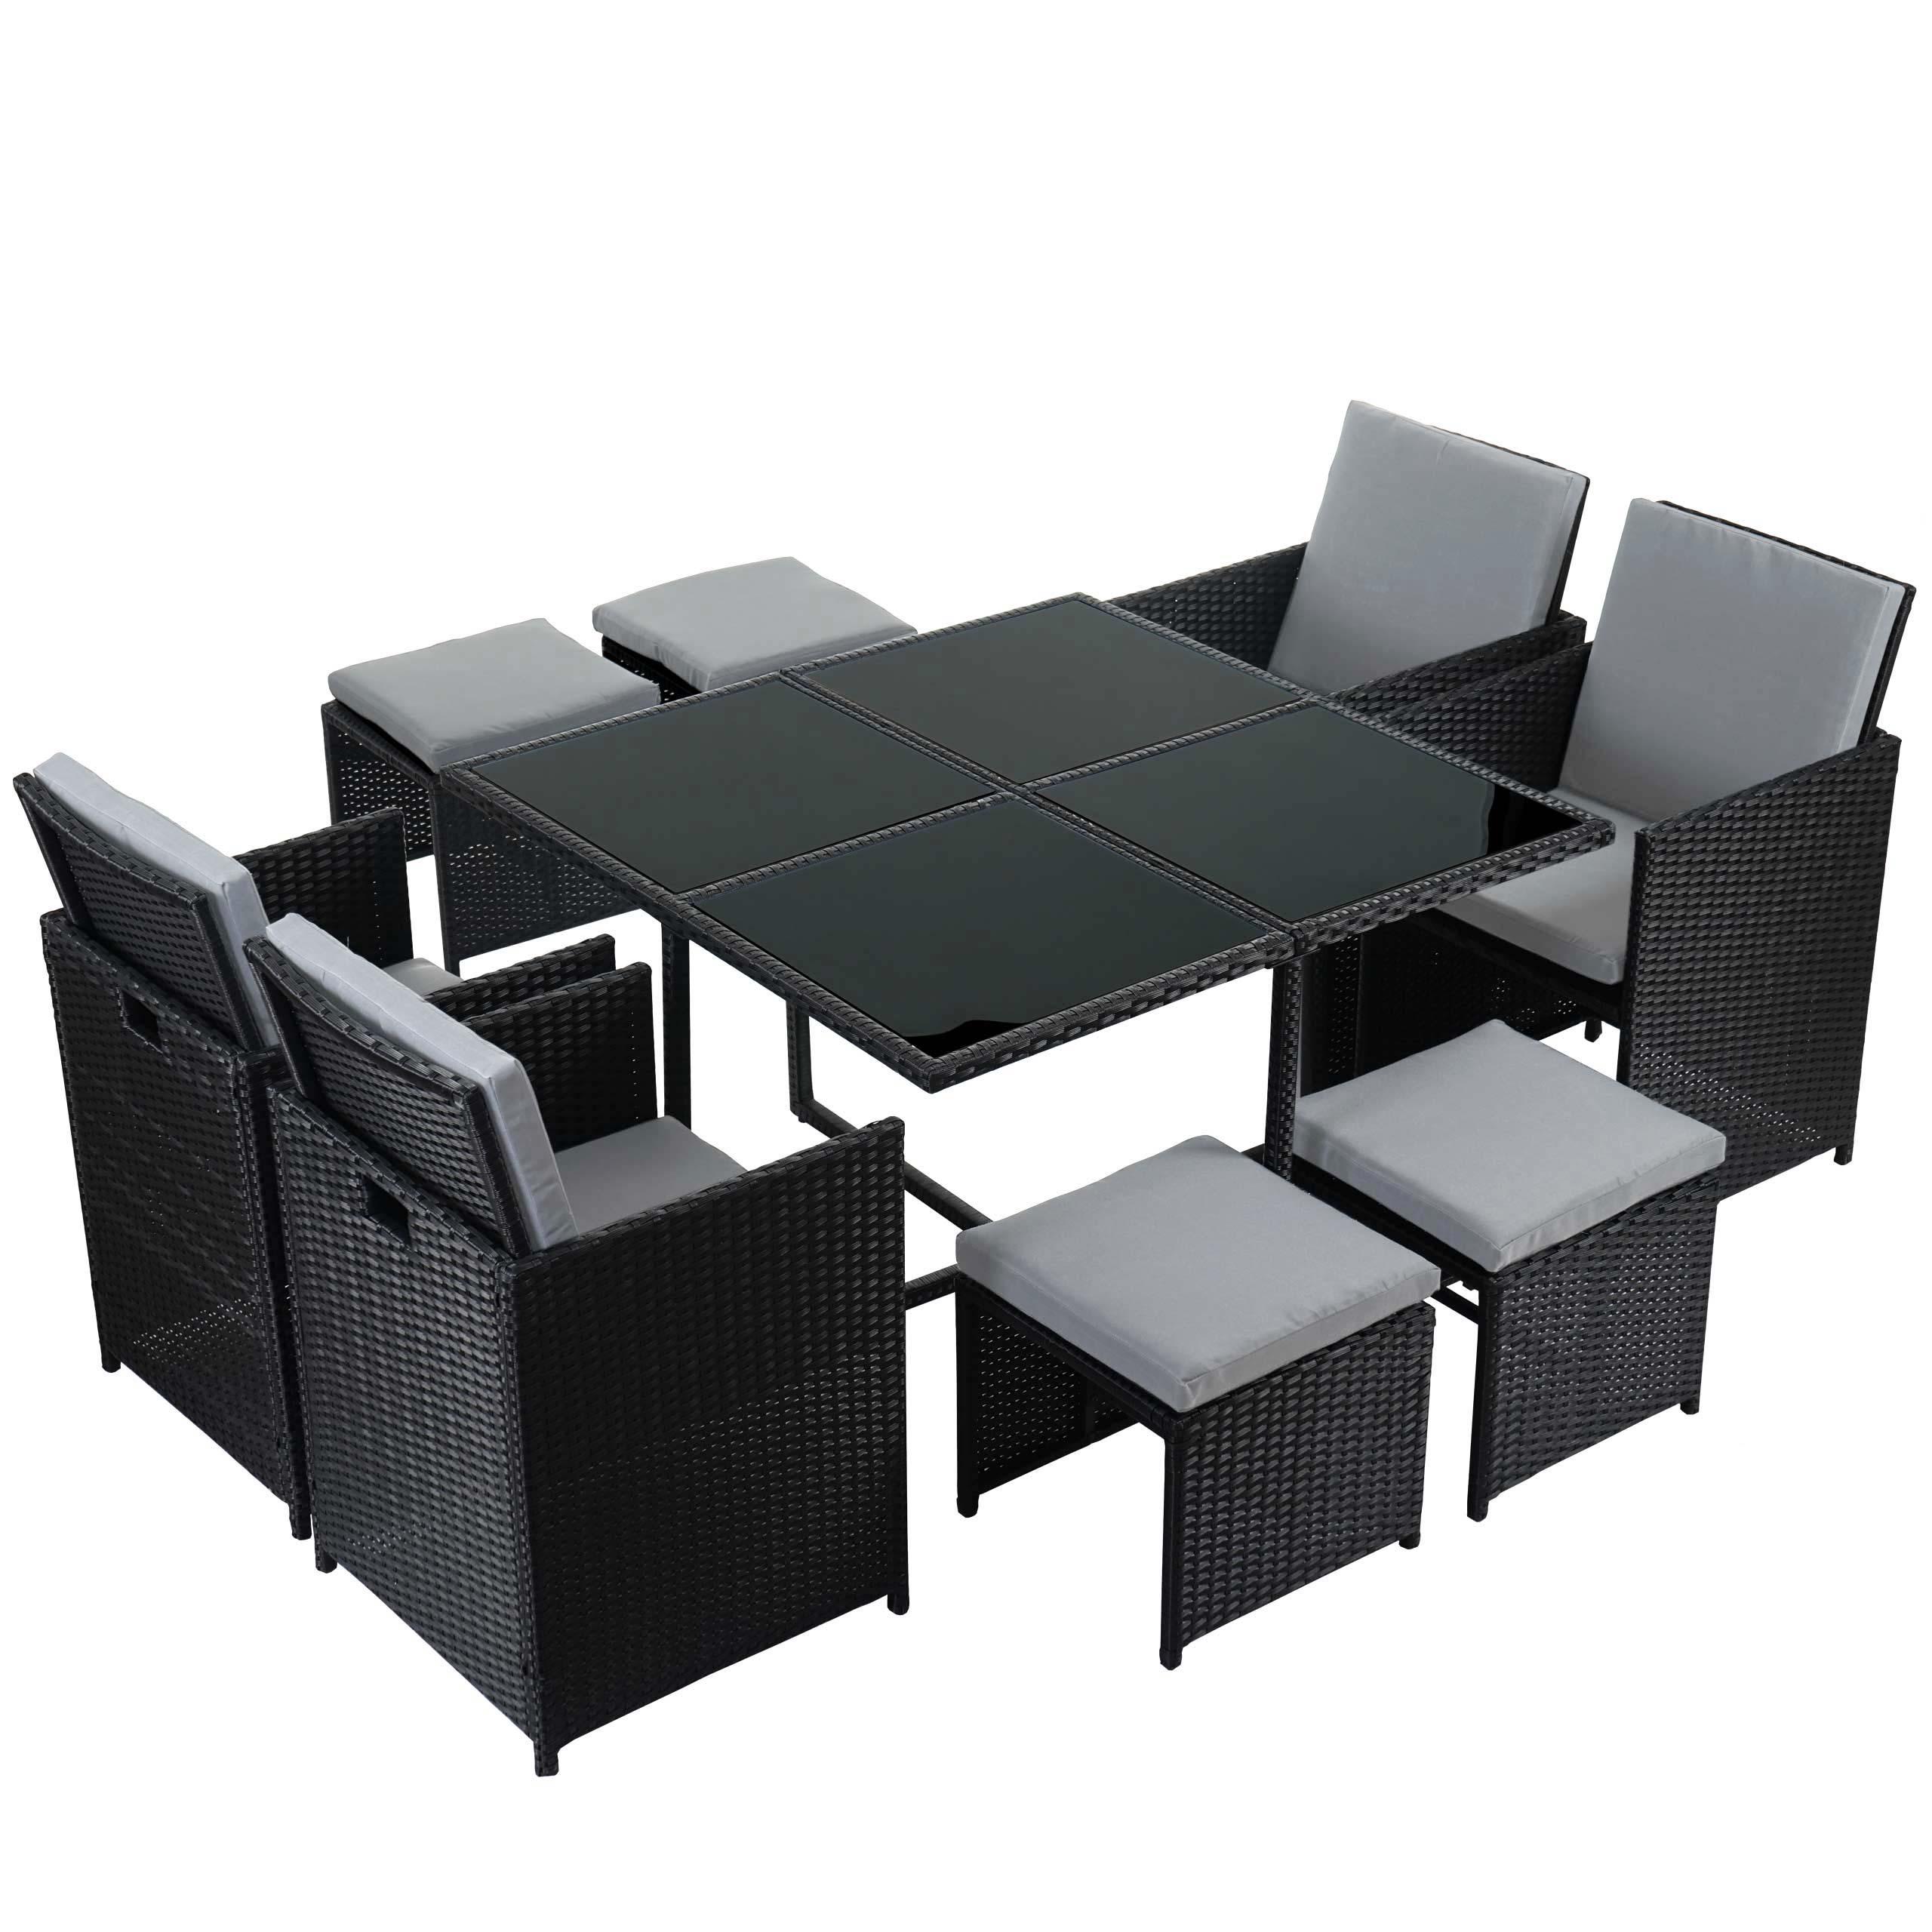 poly rattan garten garnitur kreta lounge set 4 st hle schwarz kissen hellgrau ebay. Black Bedroom Furniture Sets. Home Design Ideas